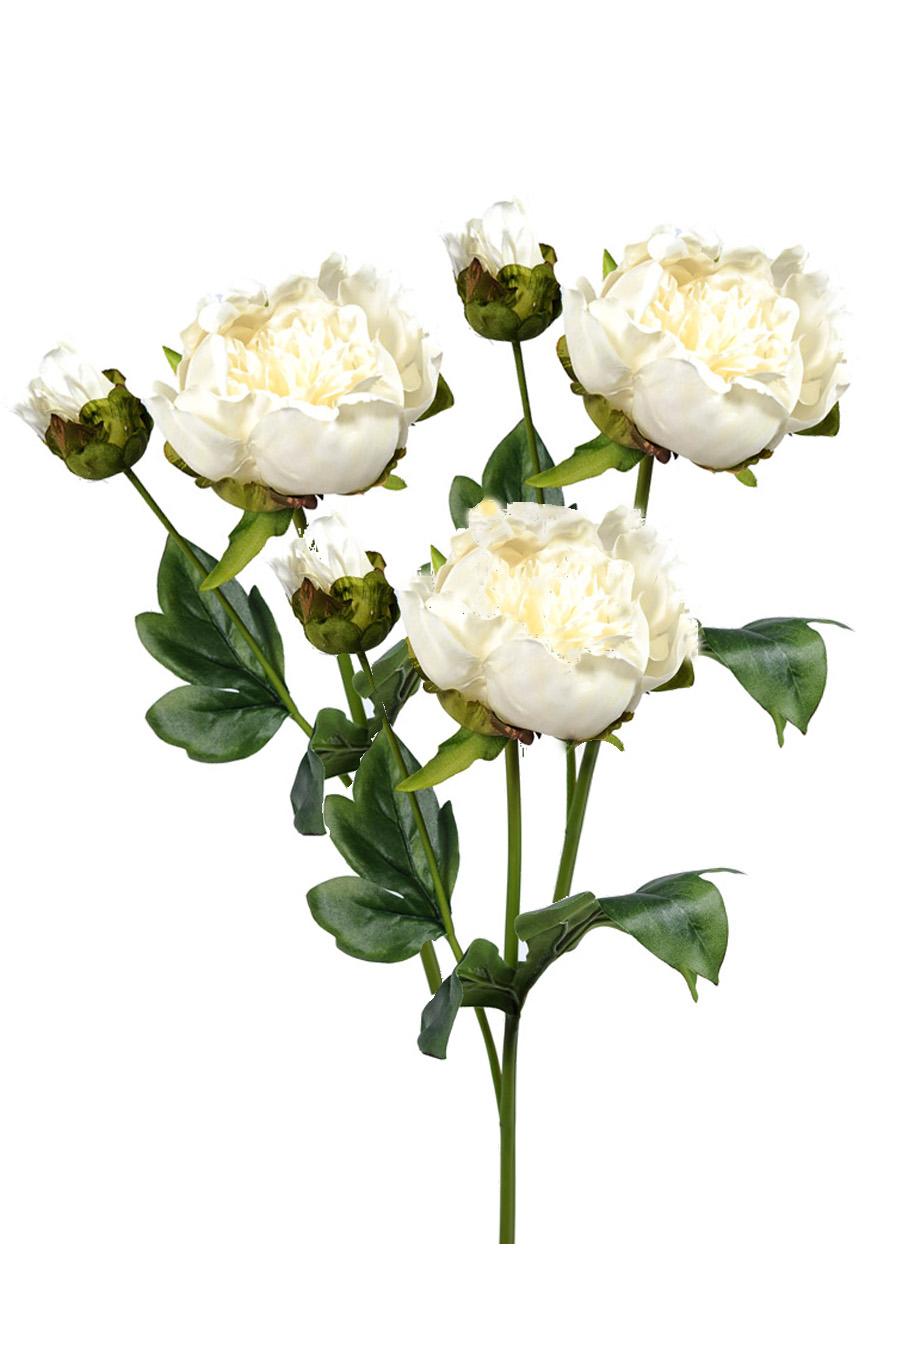 Peonies white 3 silk flowers artificial arrangements pene dene peonies white 3 artificial flower arrangement mightylinksfo